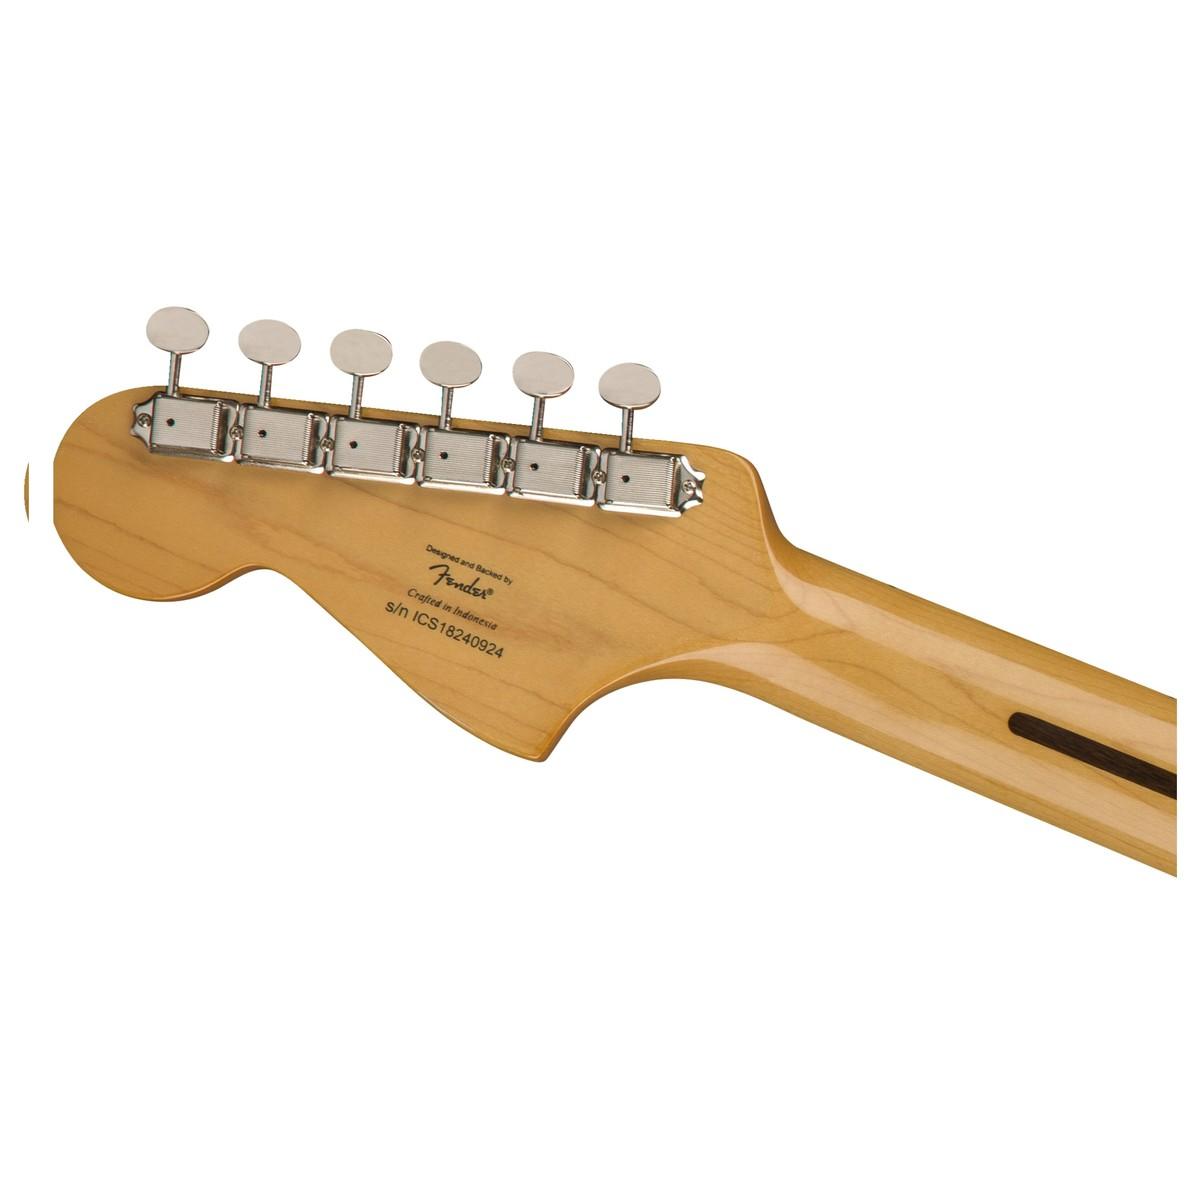 Squier Classic Vibe Bass VI LRL, Black at Gear4music